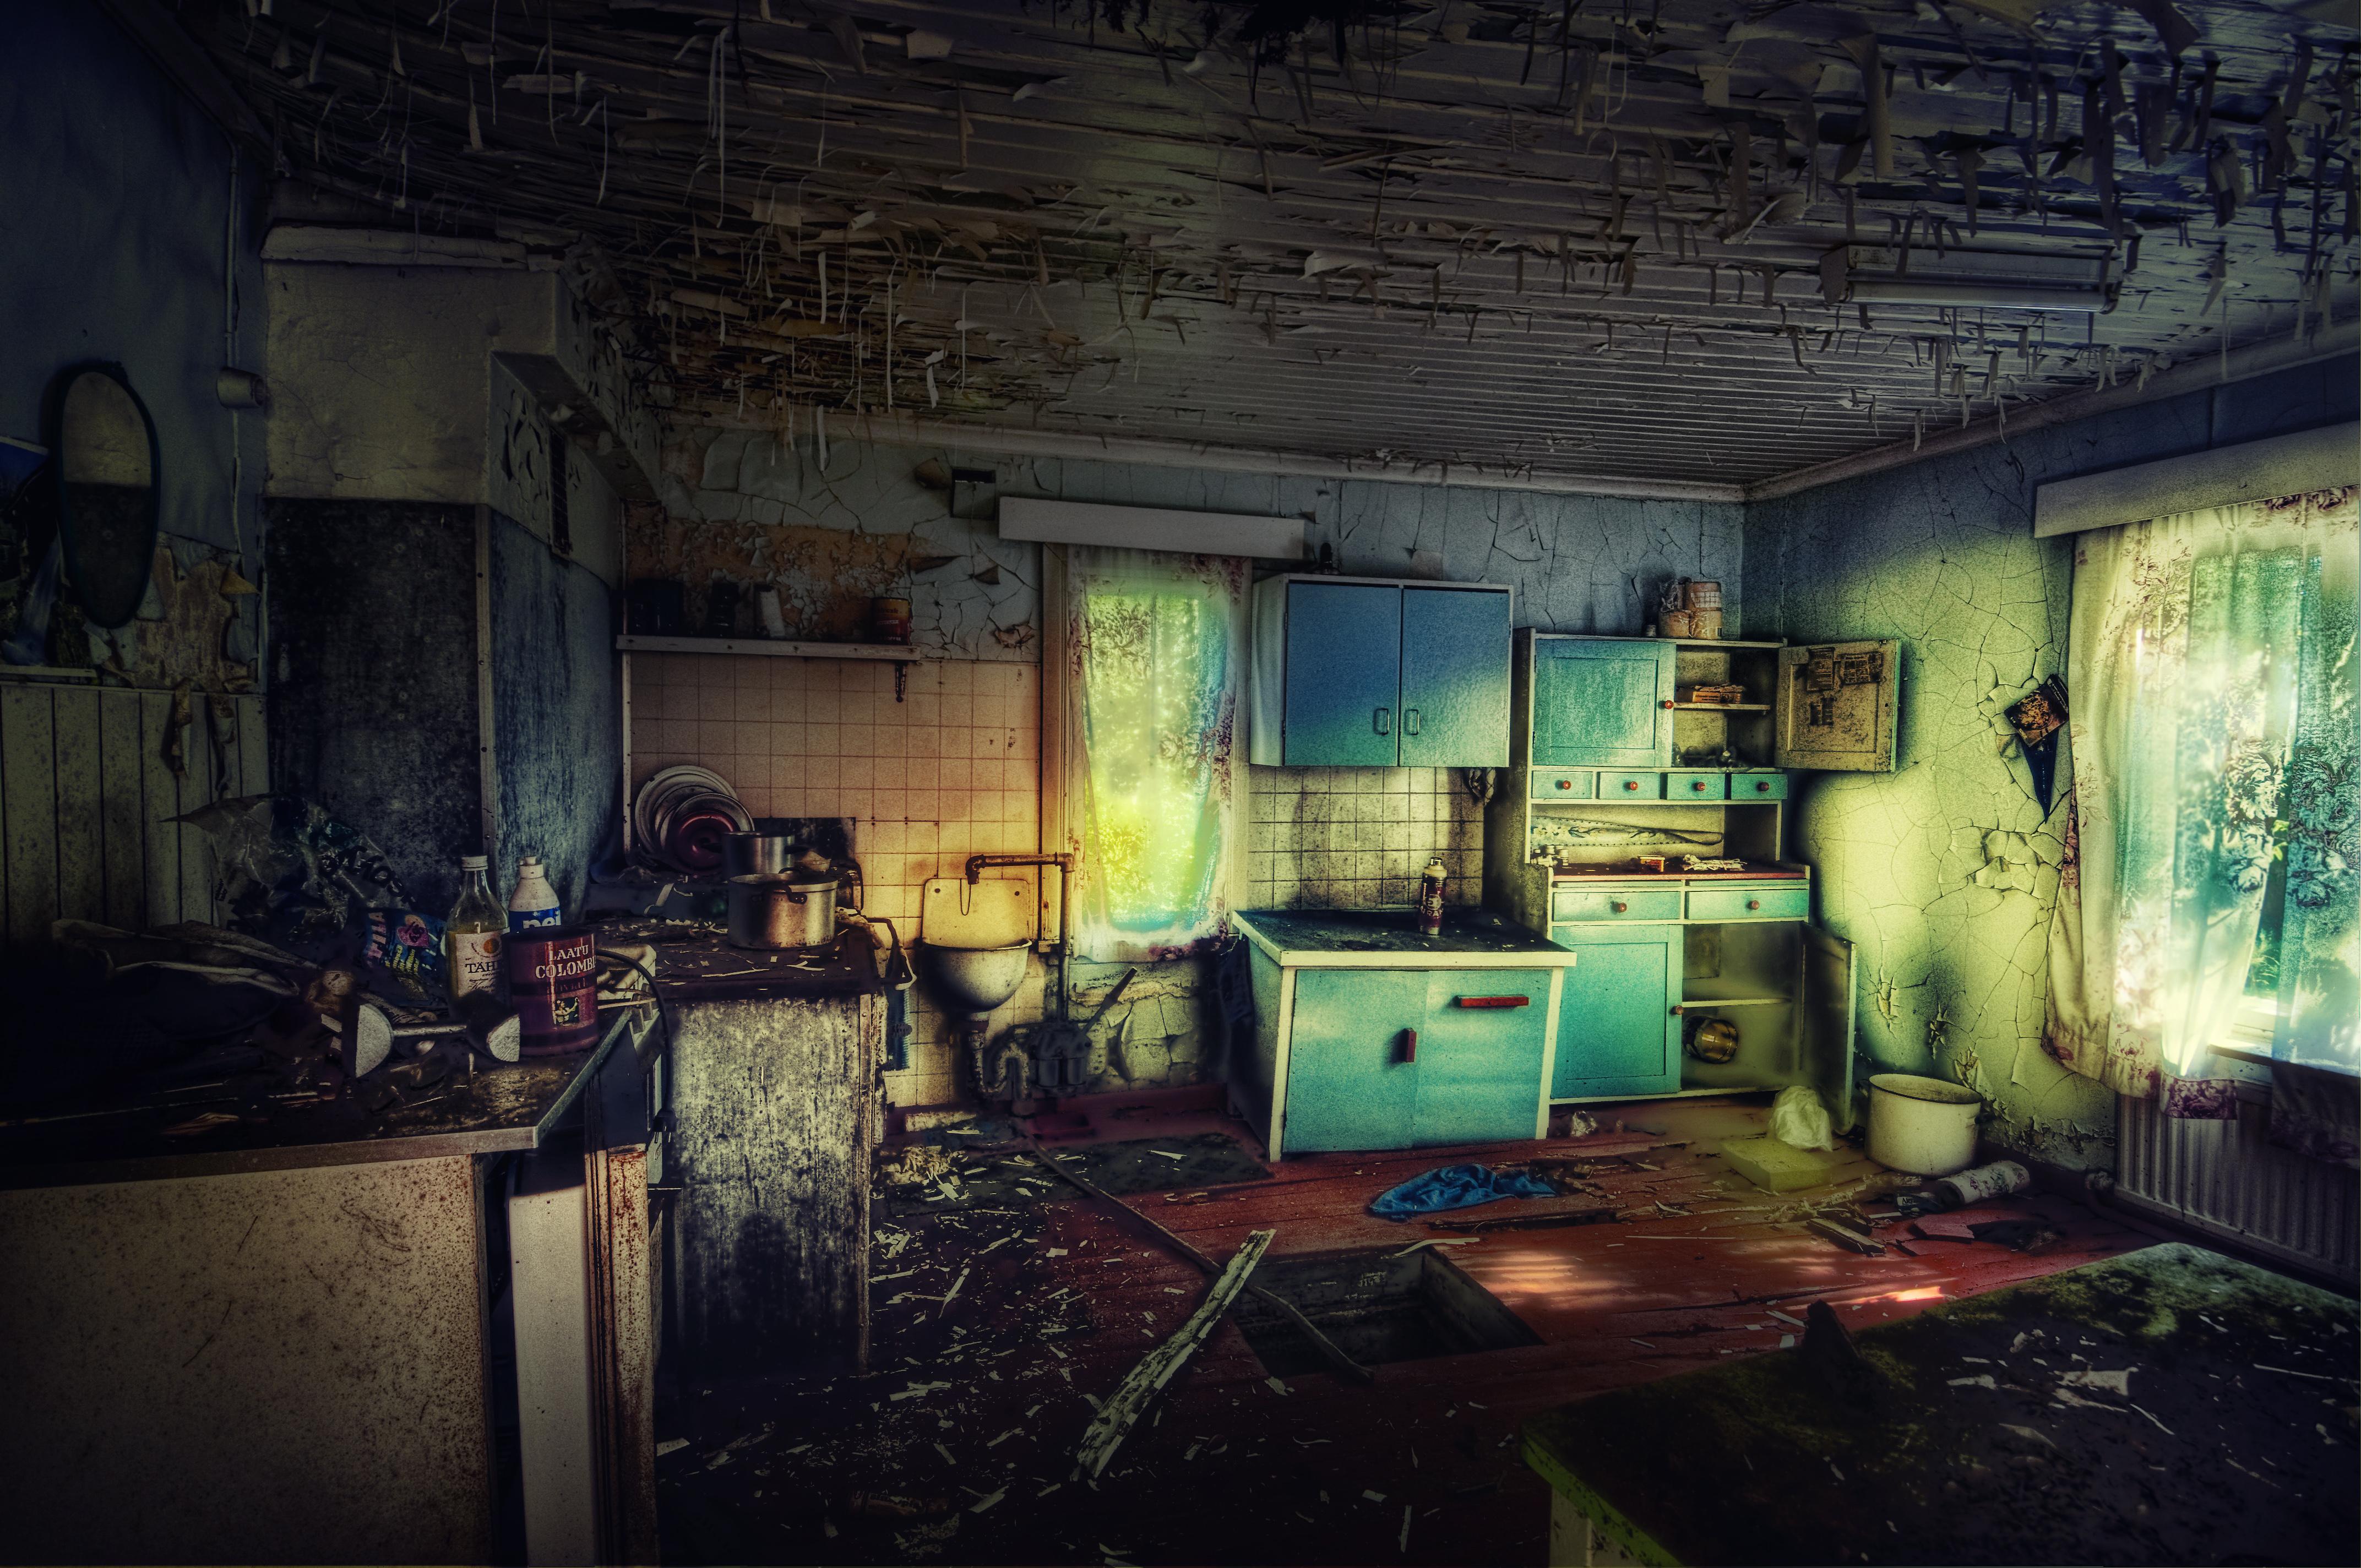 ...the abandoned house by SAMLIM